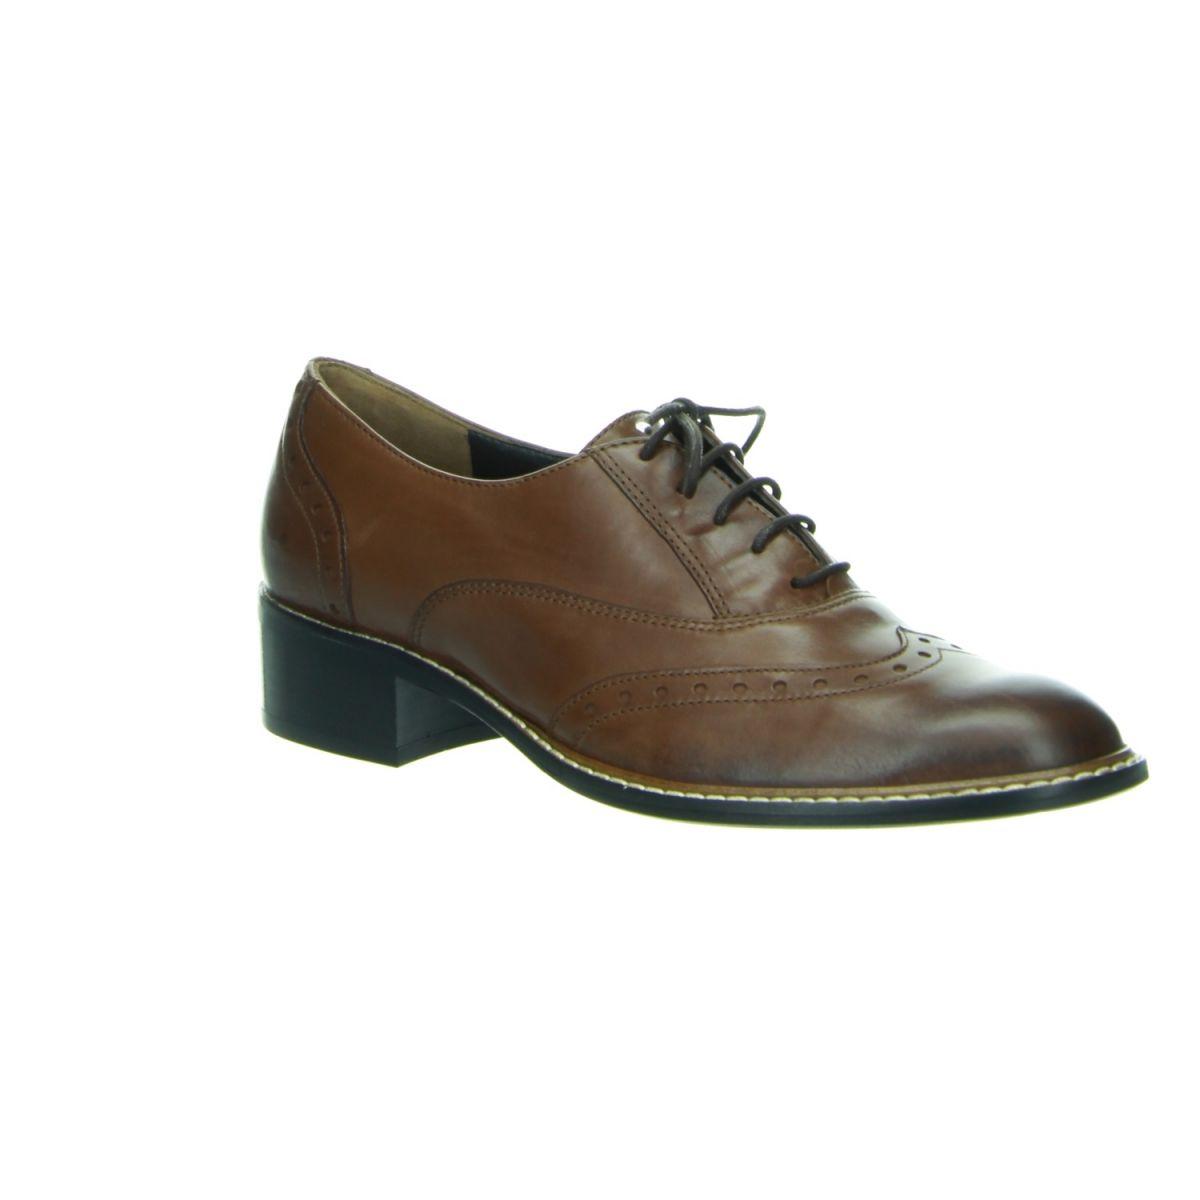 Schuhe paul green de